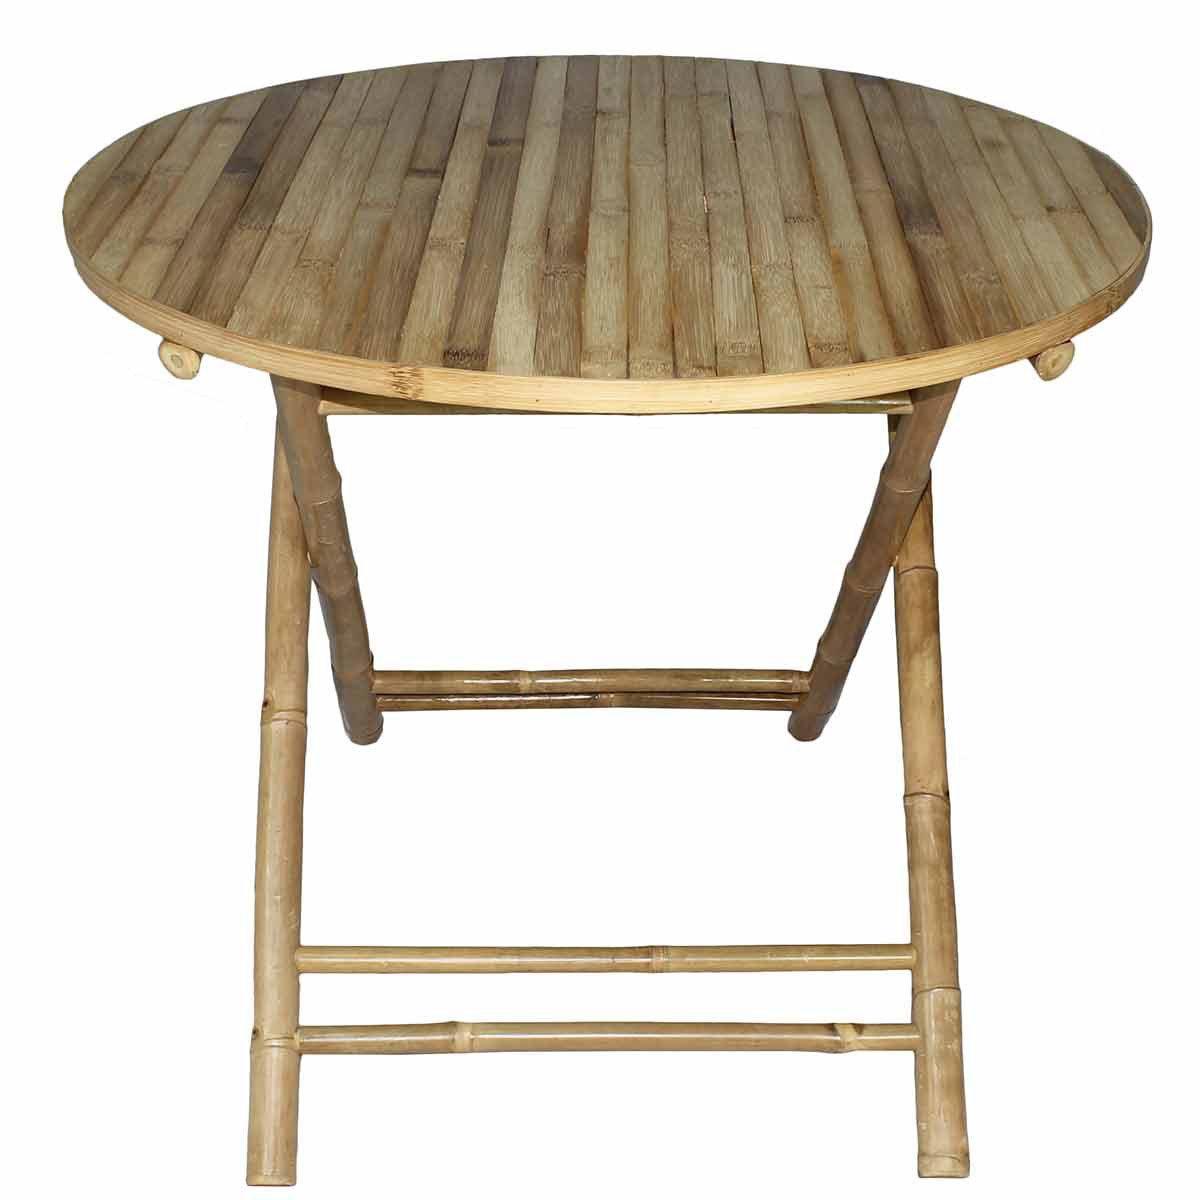 Table Repas 2 Personnes table de repas table ronde pliante taman ronde bambou naturel 2 personnes